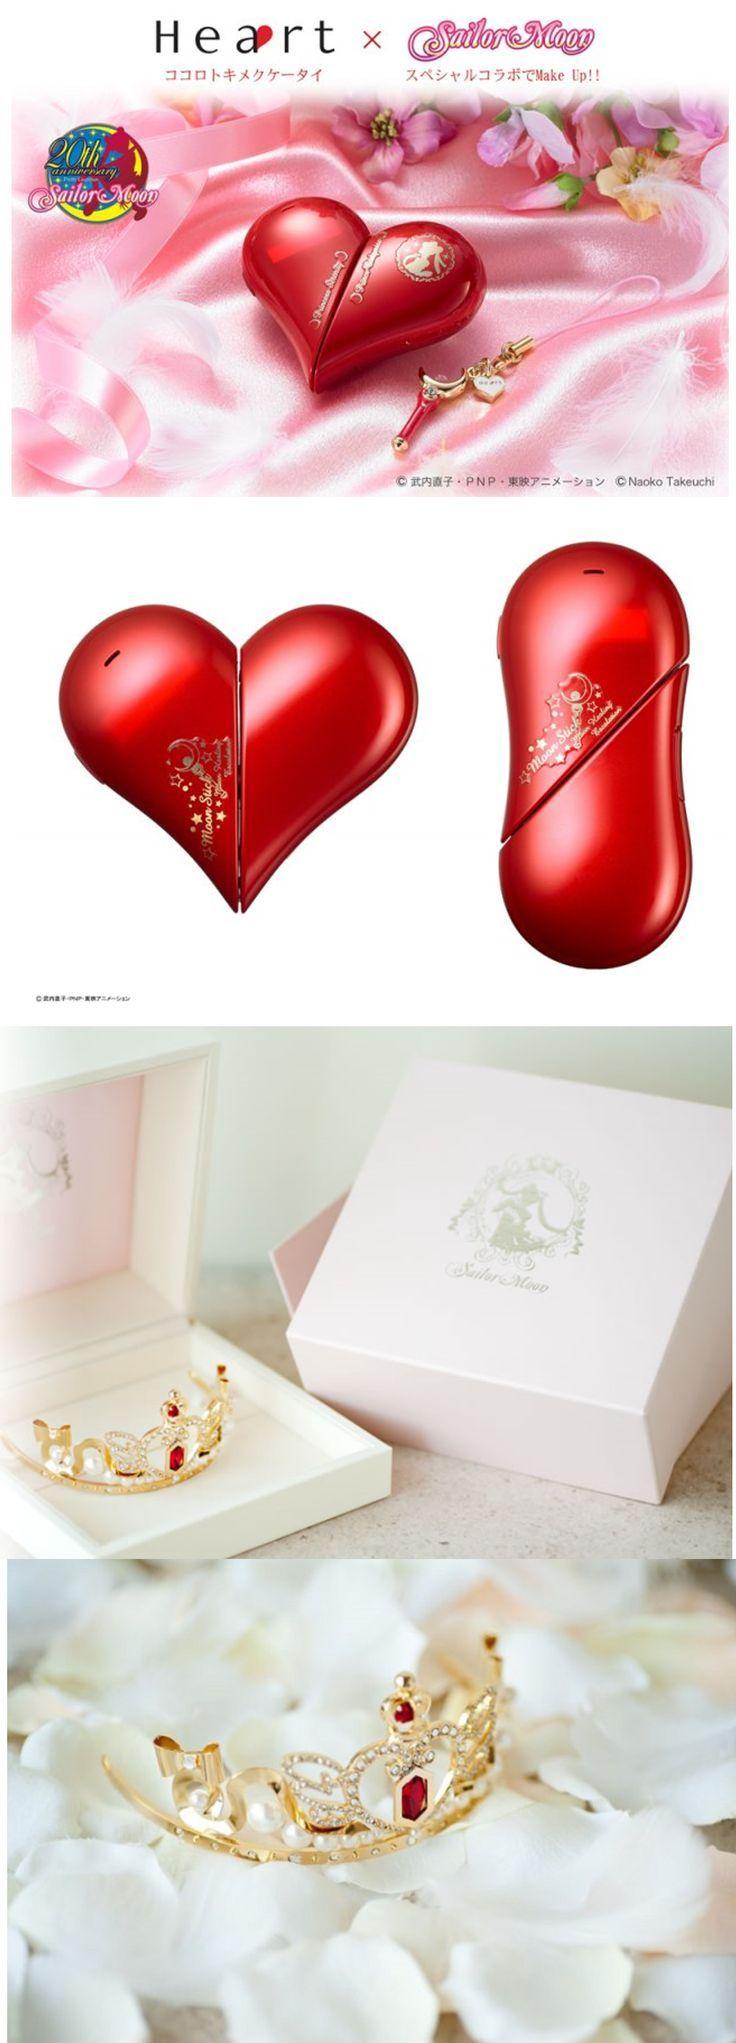 Sailor Moon Wedding Theme Gifts Fantastical Weddings Gifts fantasticalweddings.com Create your own Geek Wedding!